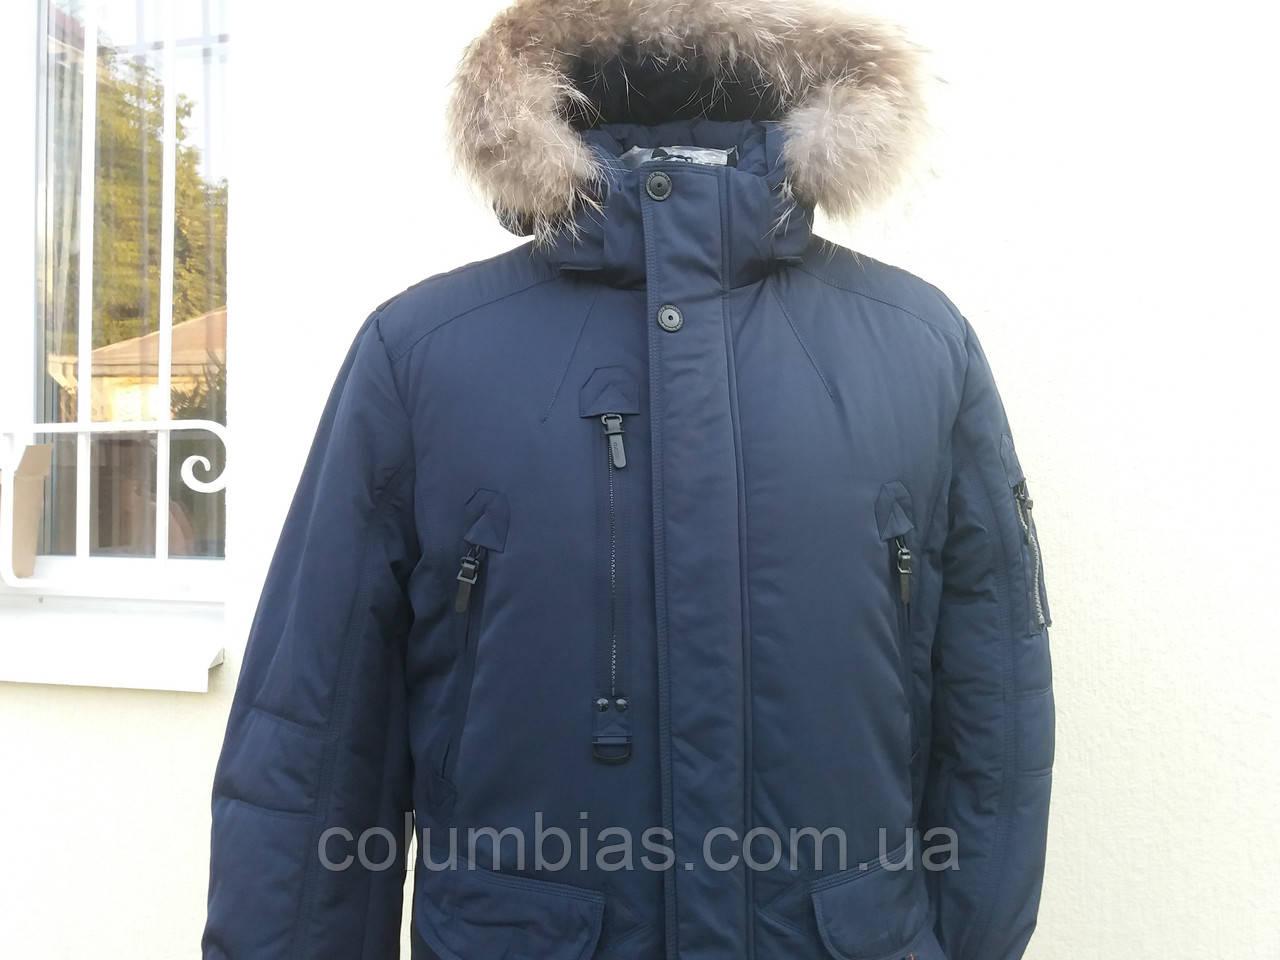 Куртка пуховик аляска утеплённая до - 38 С